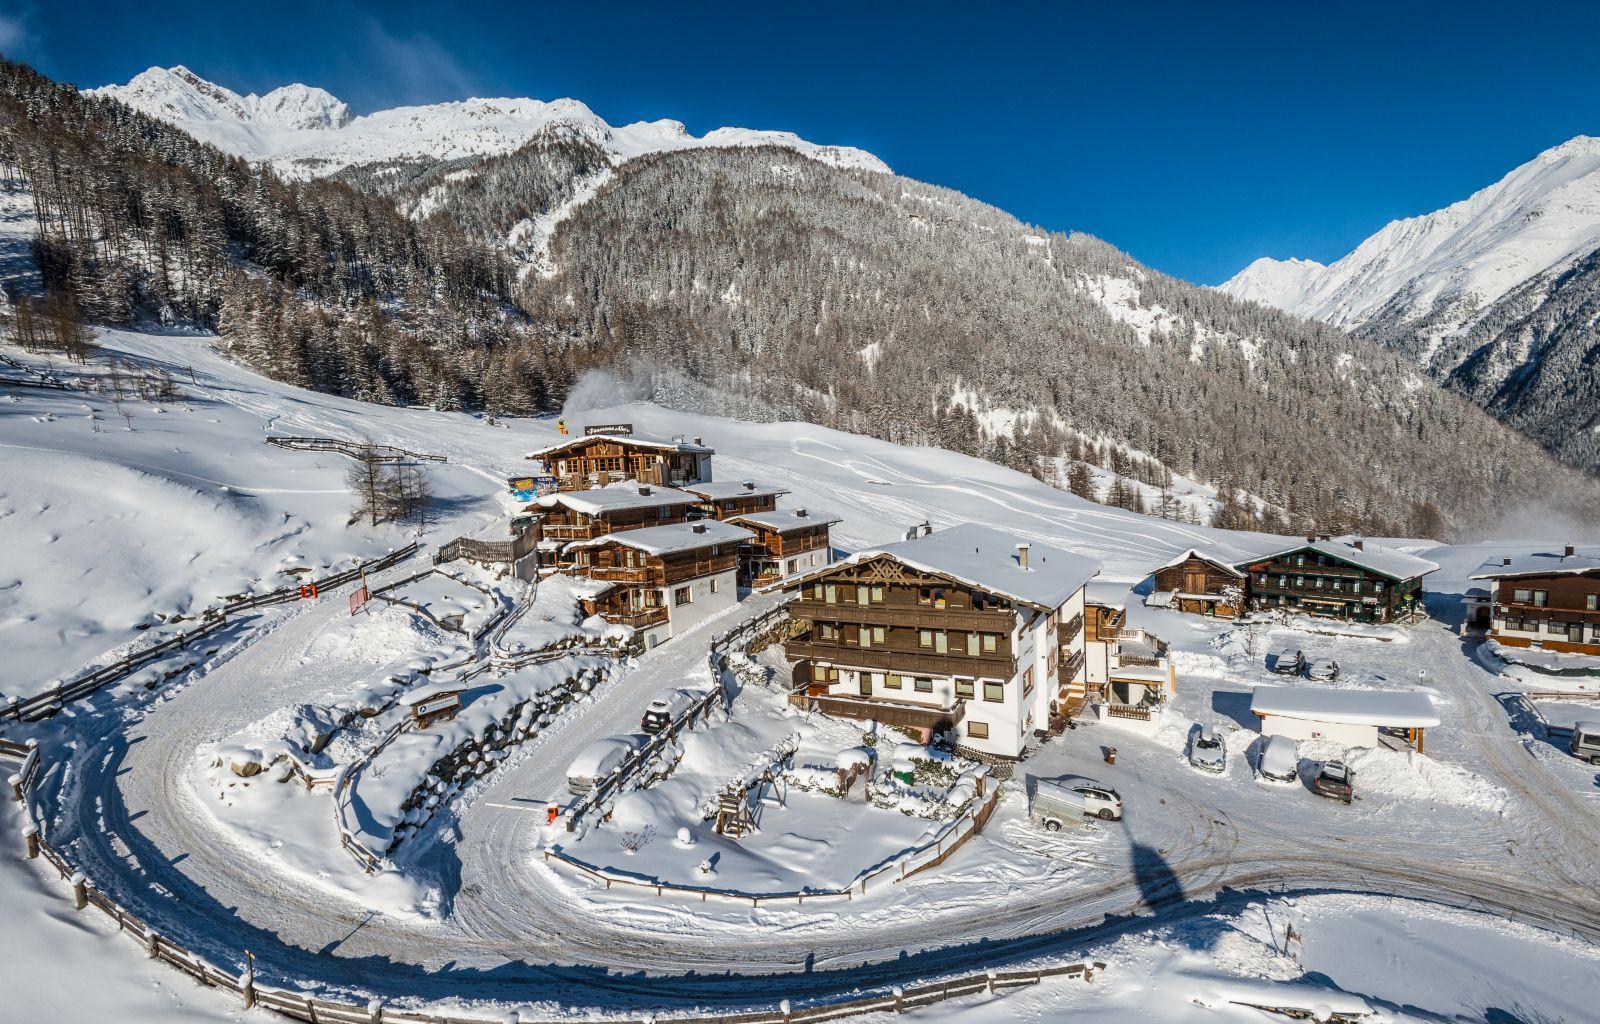 Grünwald Alpine Lodge III Tirol